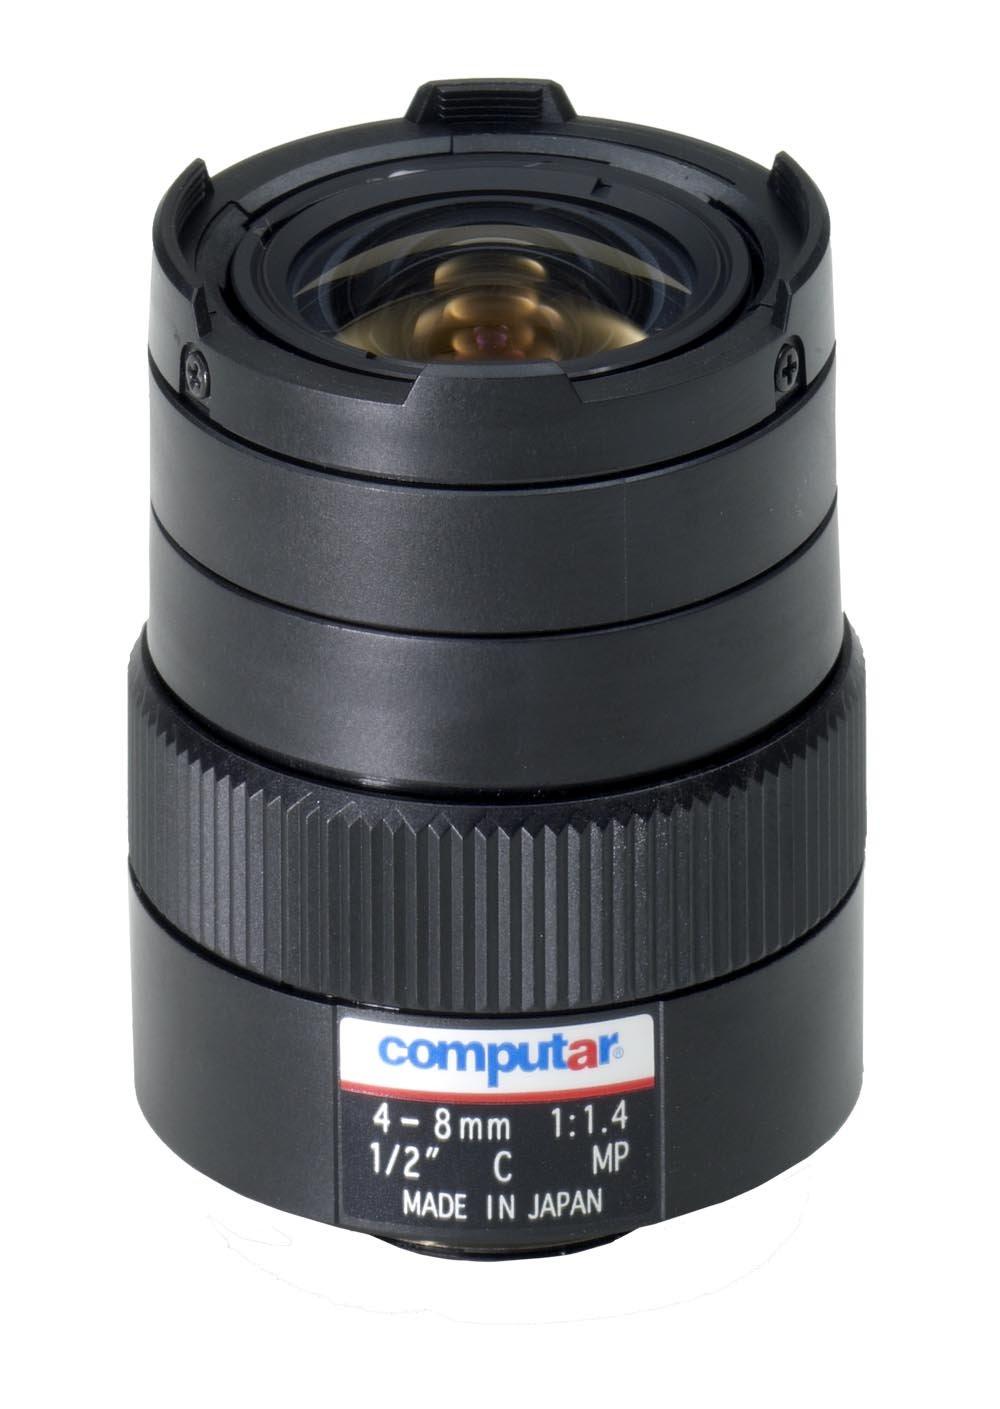 Computar H2Z0414C-MP 0.5-Inch 1.3 Megapixel Varifocal lens 4-8mm F1.4 Manual Iris by Computar